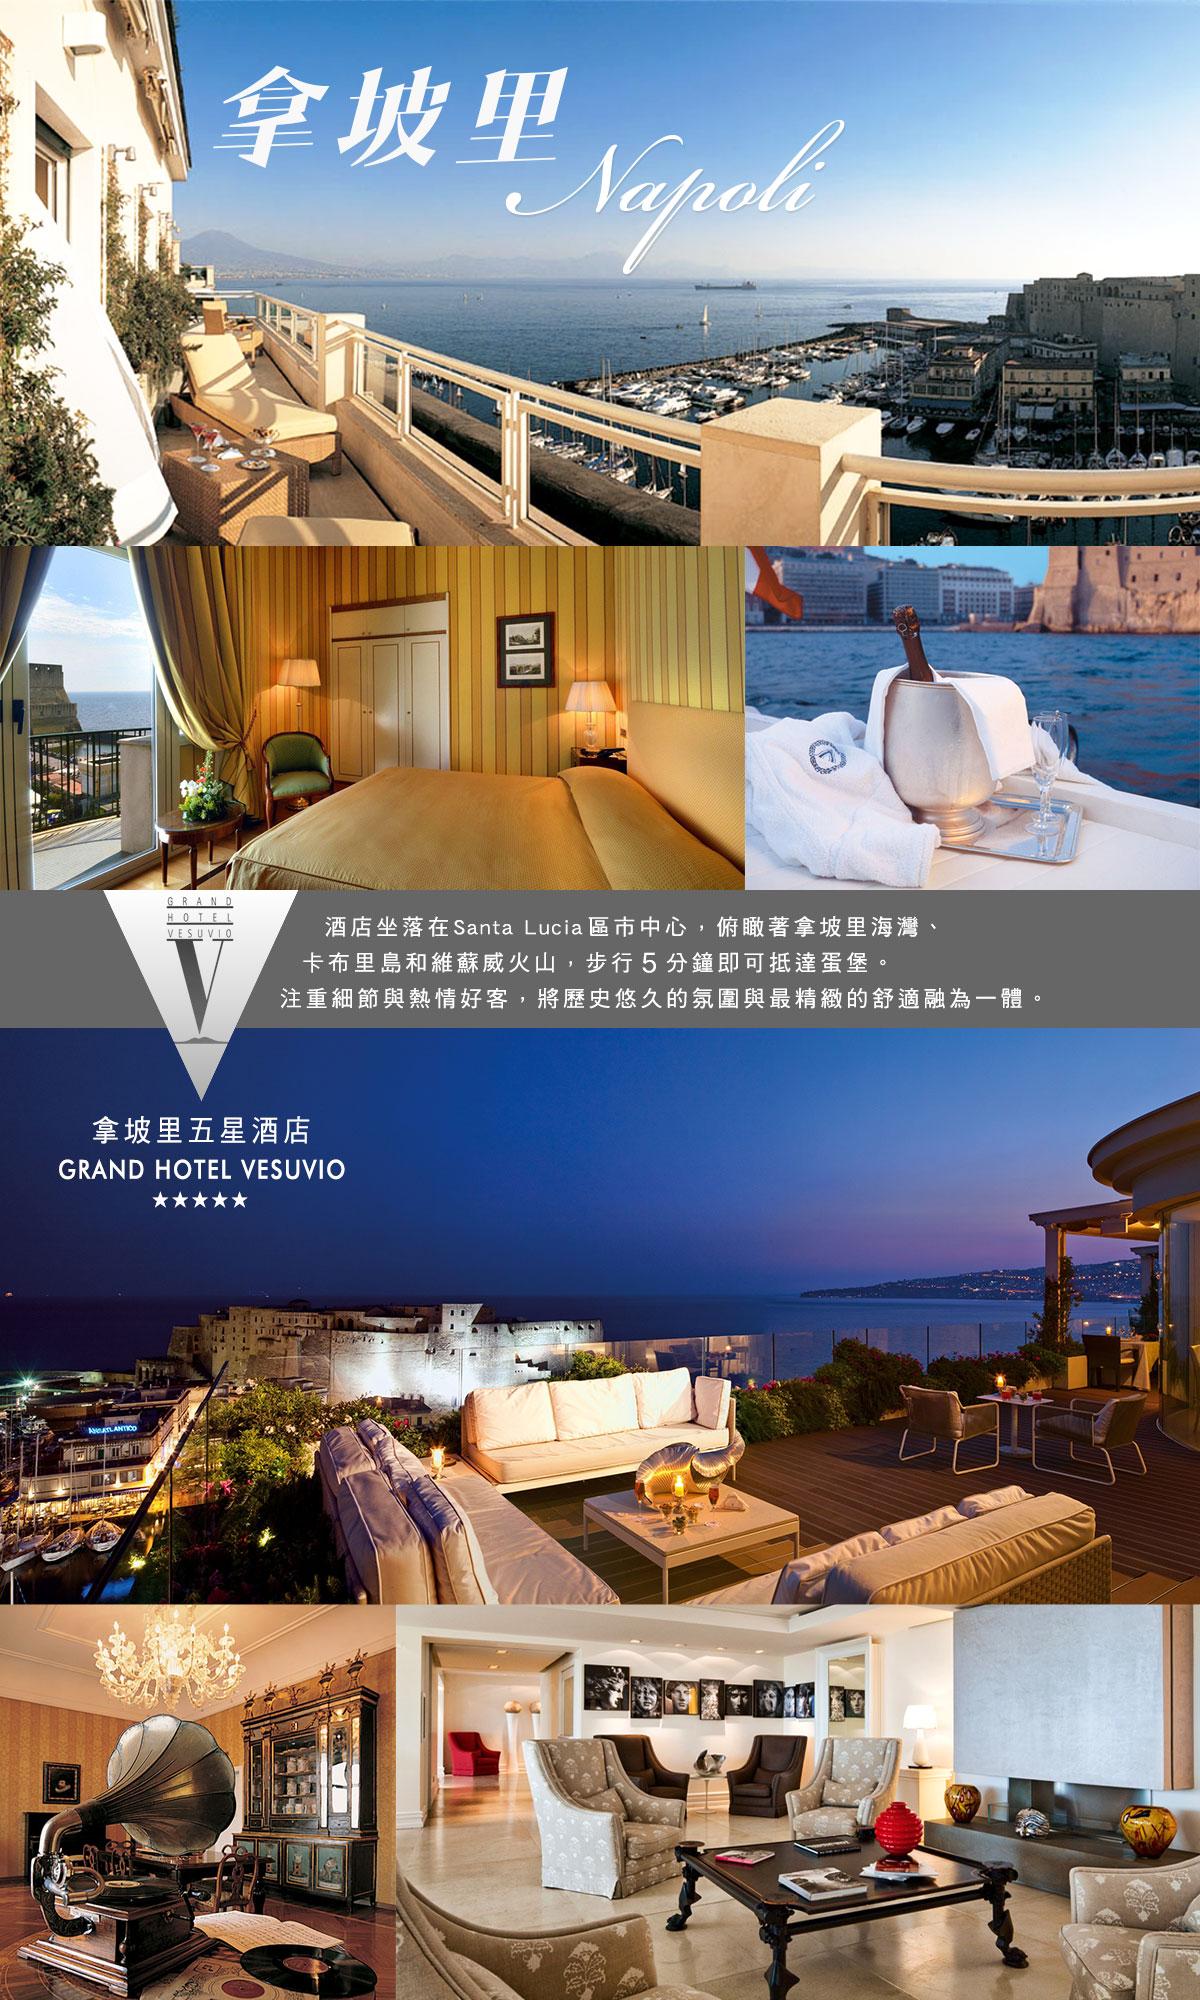 拿坡里五星酒店GRAND HOTEL VESUVIO